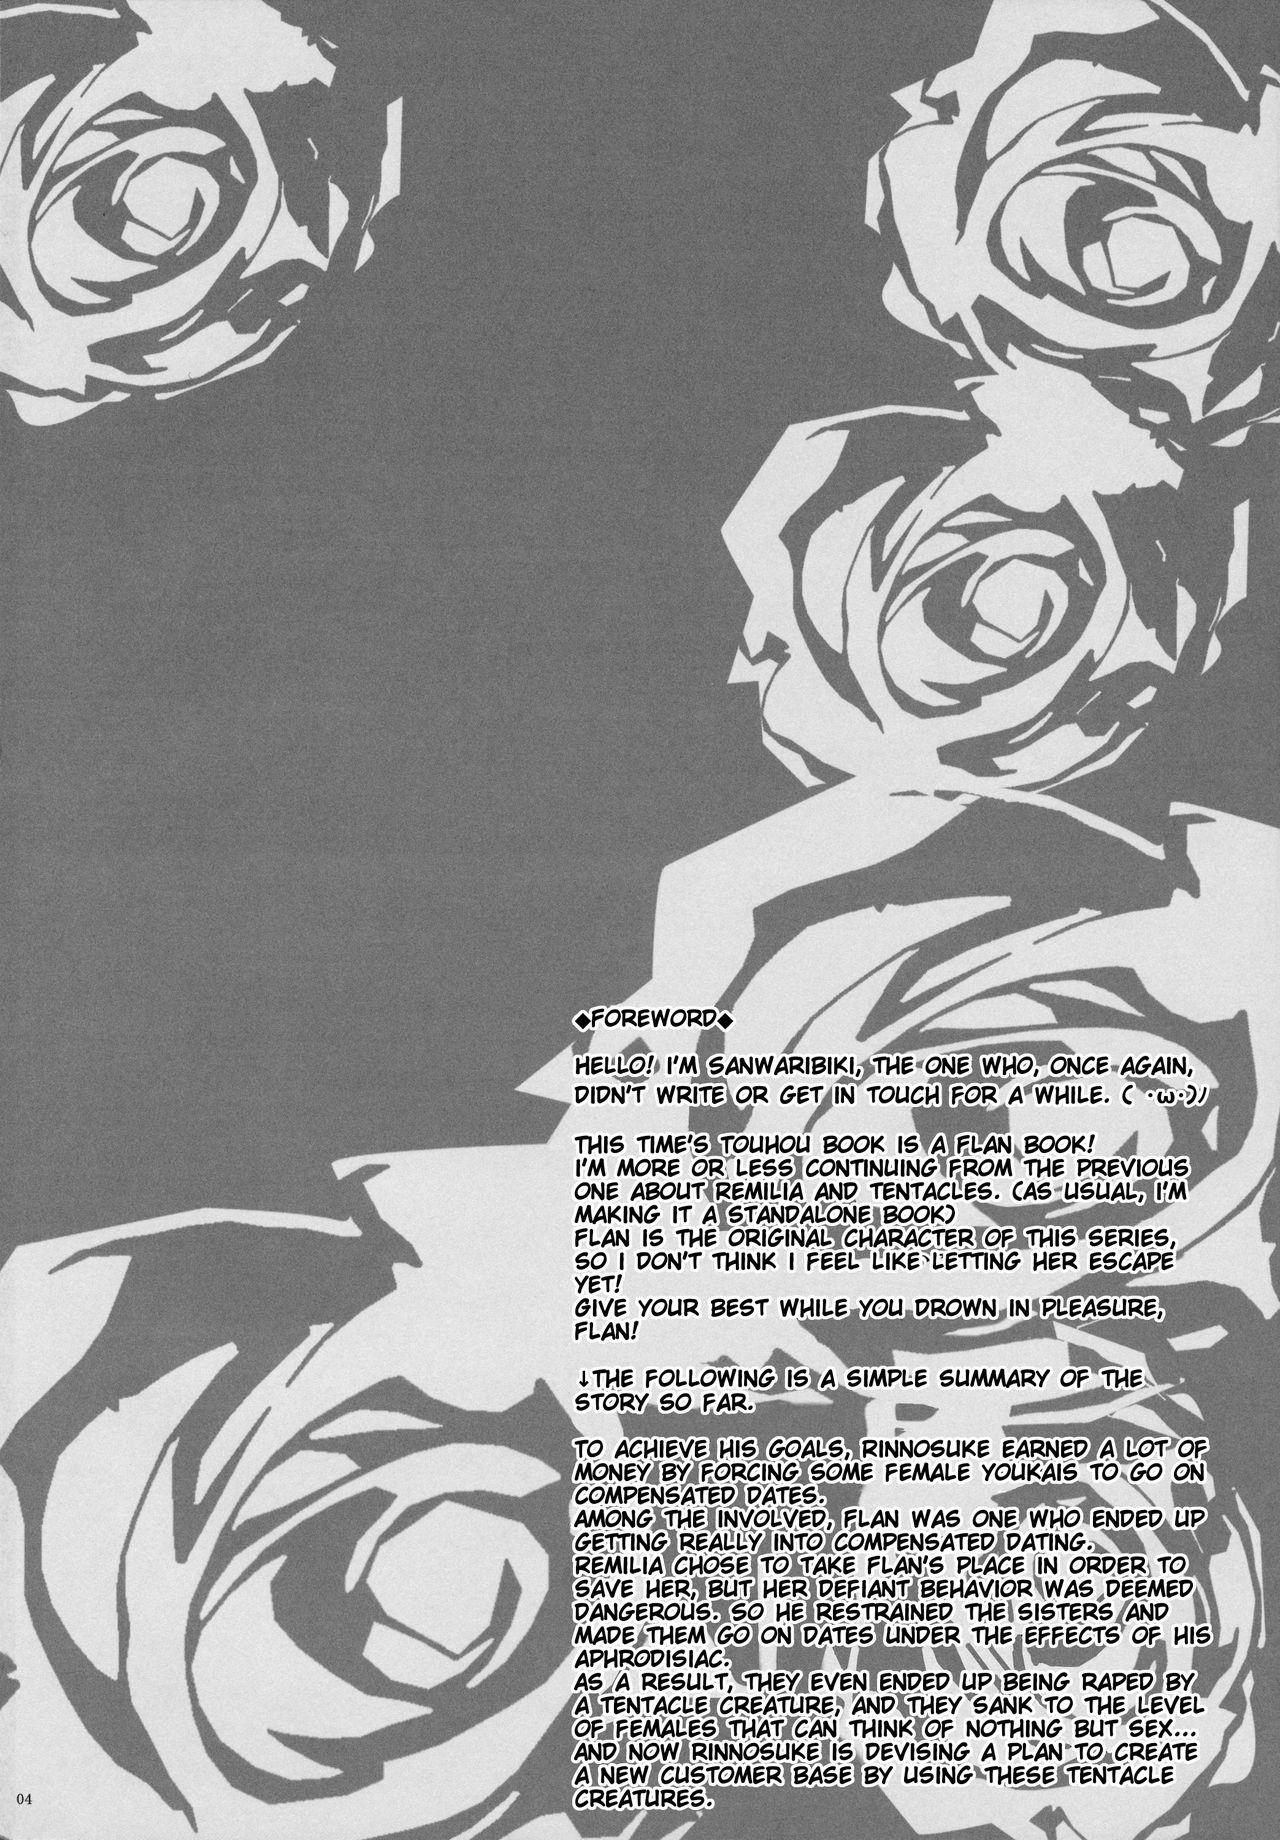 (C91) [MegaSoundOrchestra (Sanwaribiki)] Gensou Enkou -Flandre- Shoku (Touhou Project) [English] [SMDC] 3